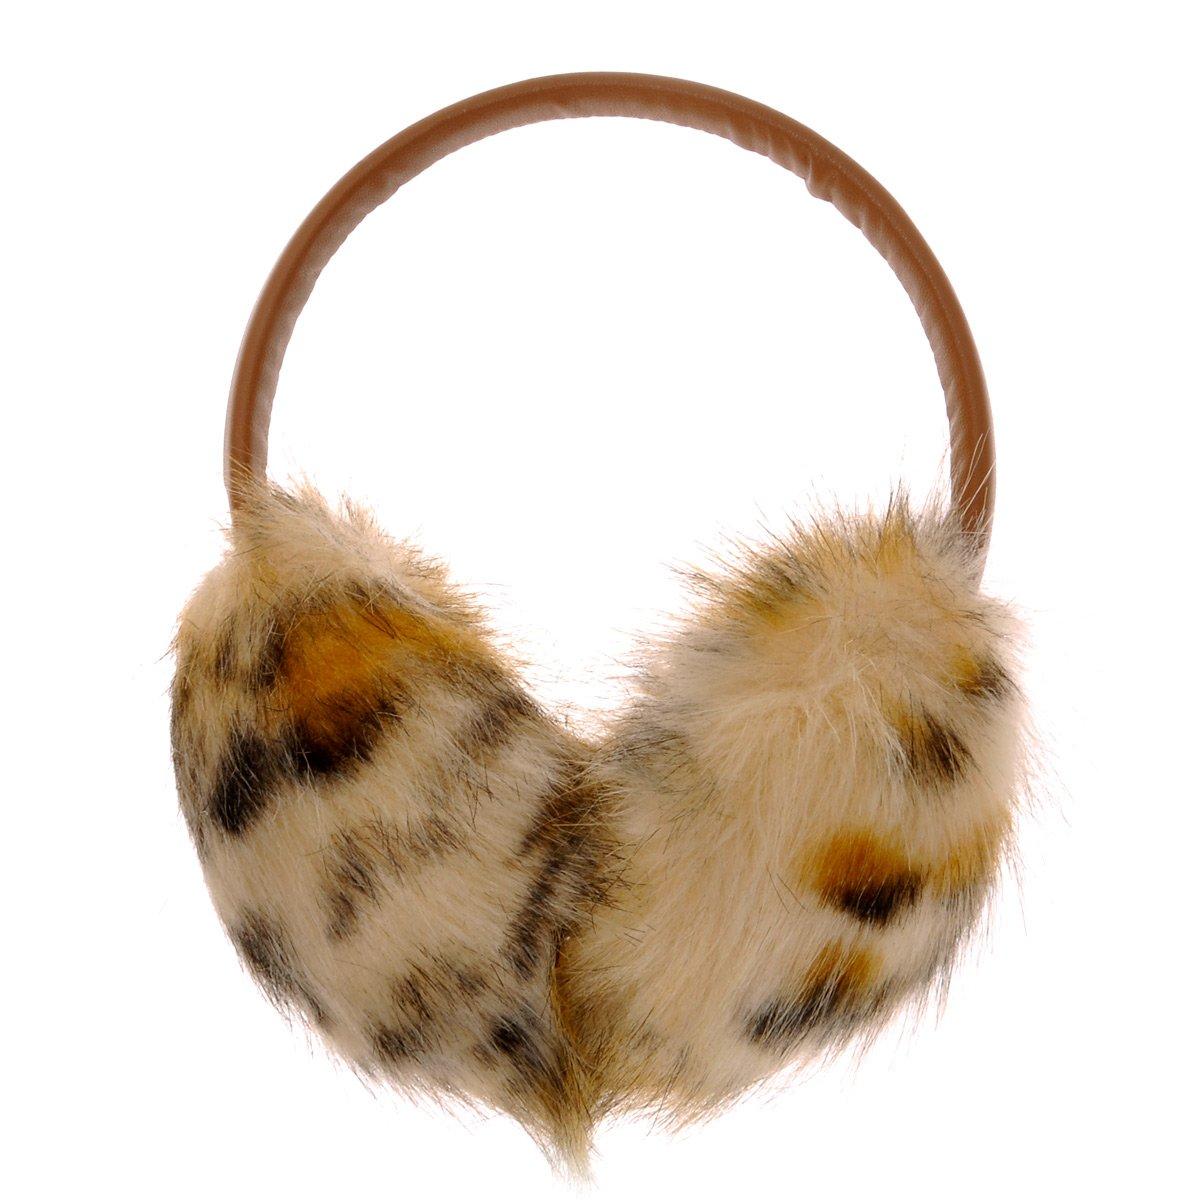 ZLYC Womens Girls Winter Fashion Adjustable Faux Fur EarMuffs Big Ear Warmers ((Leopard print) Brown)